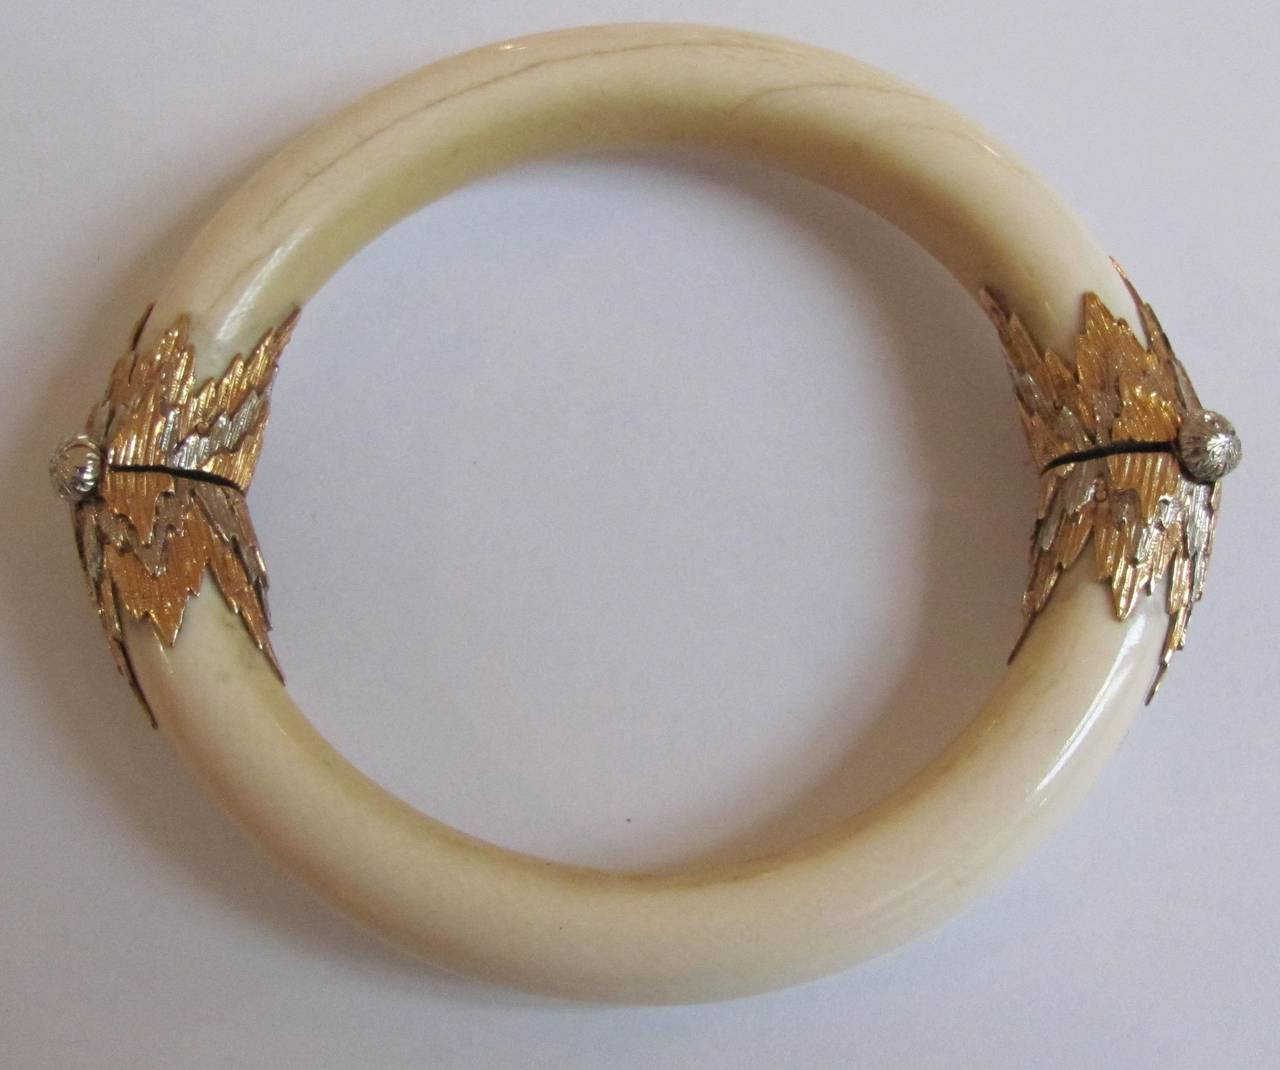 Art Deco 1930s Mario Buccellati Unique Ivory Gold Bracelets For